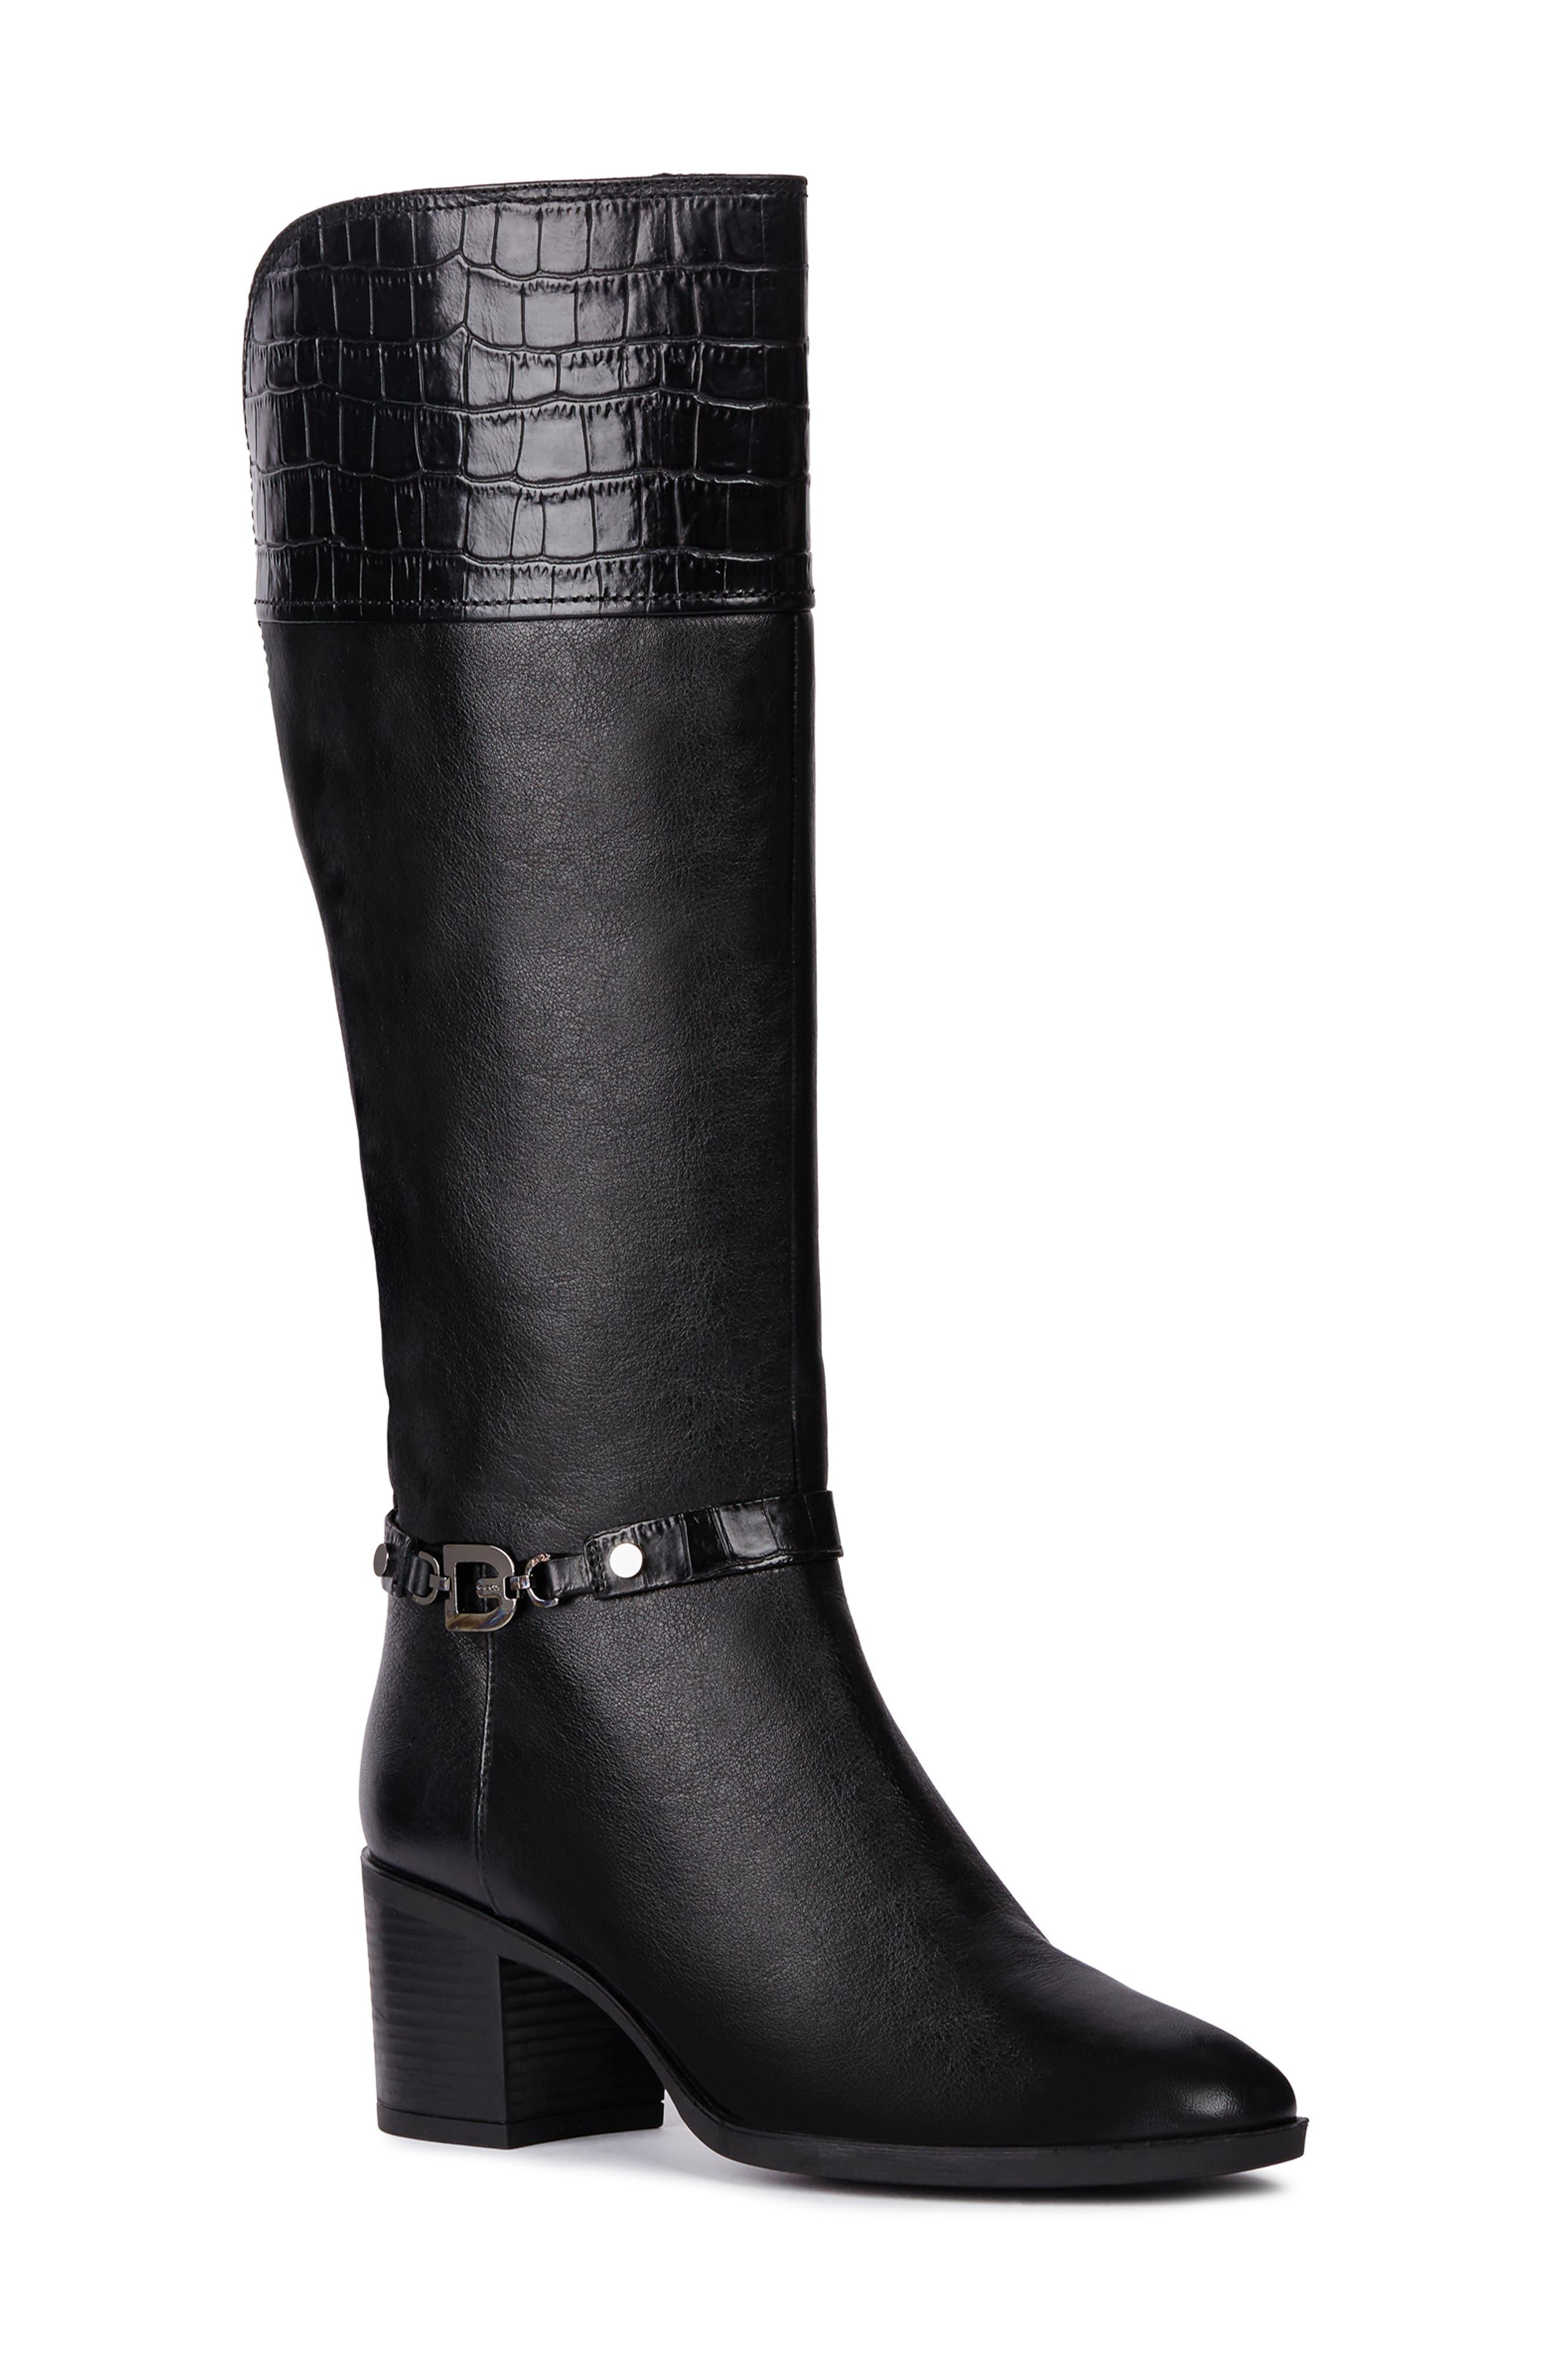 Glynna Knee High Boot,                             Main thumbnail 1, color,                             BLACK/ BLACK LEATHER